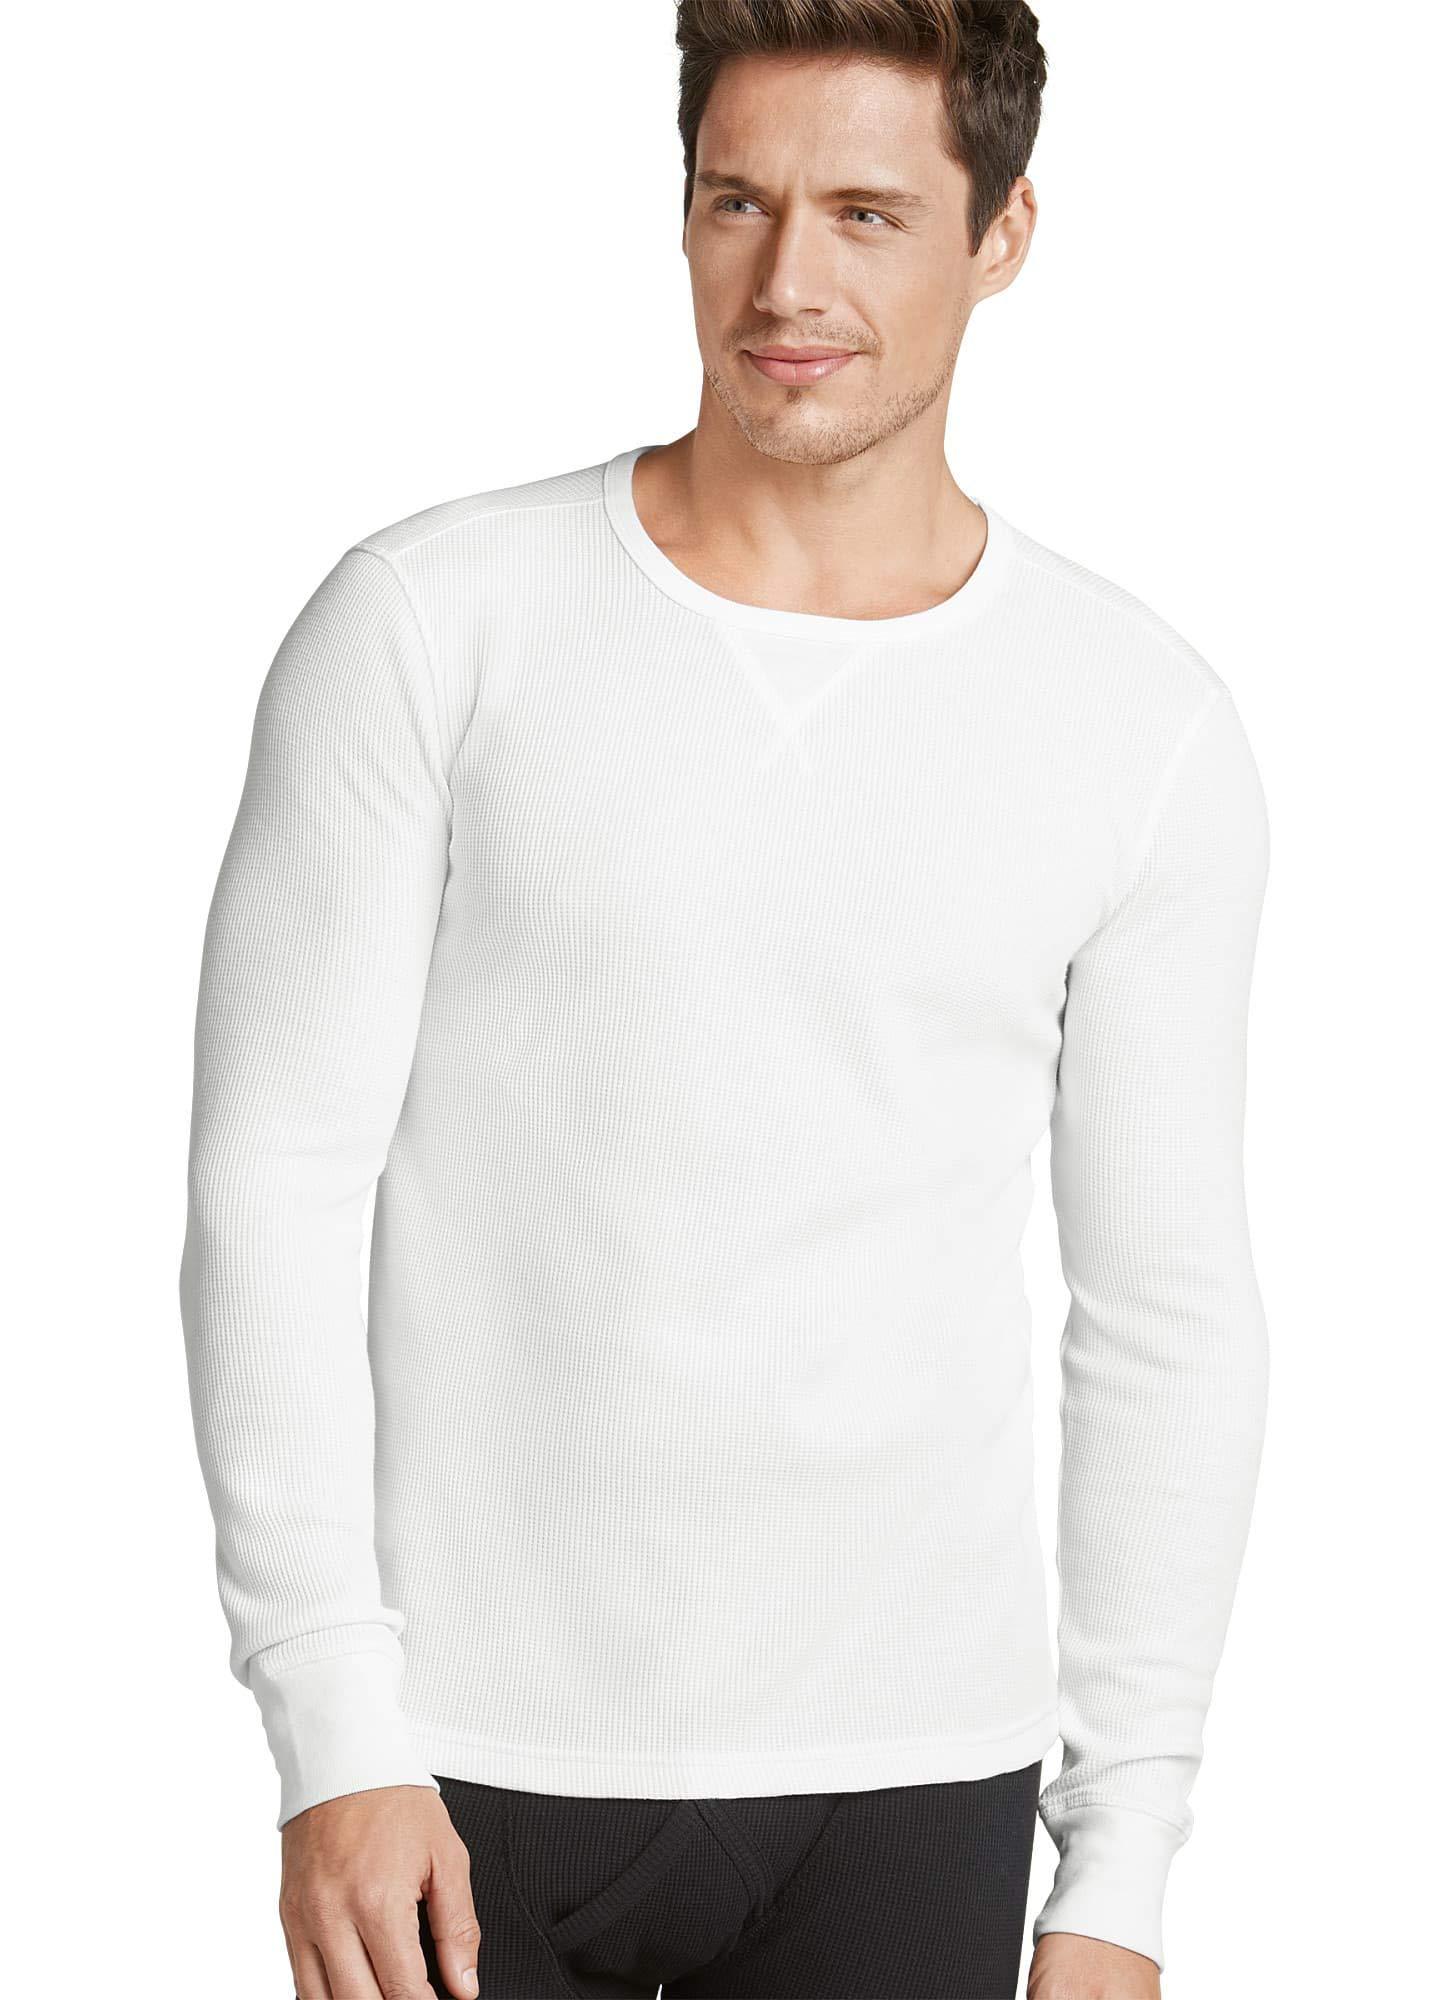 Jockey Men's T-Shirts Long Sleeve Waffle Crew, White, XL by Jockey